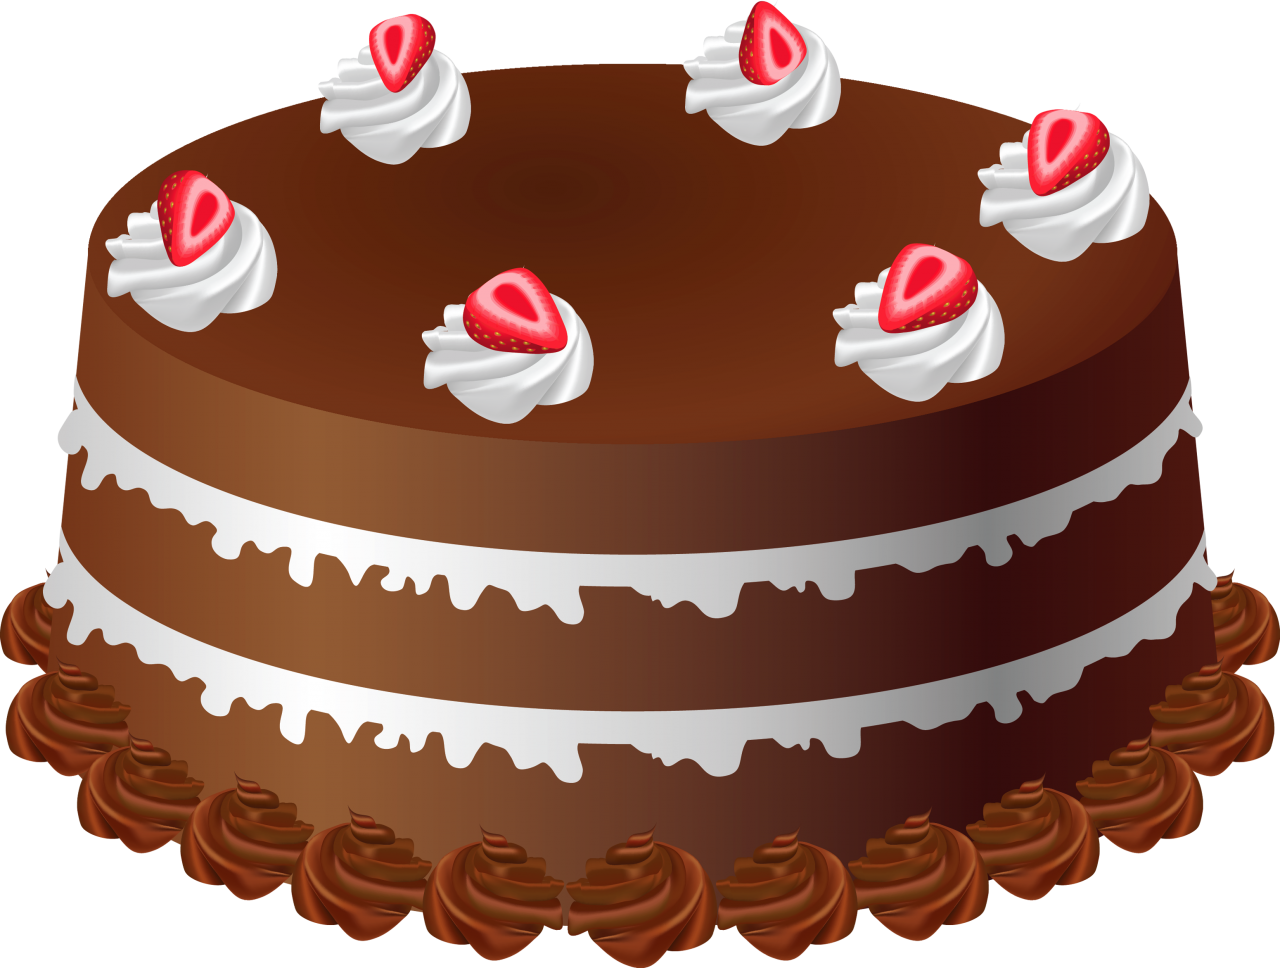 Chocolate Cake PNG Image